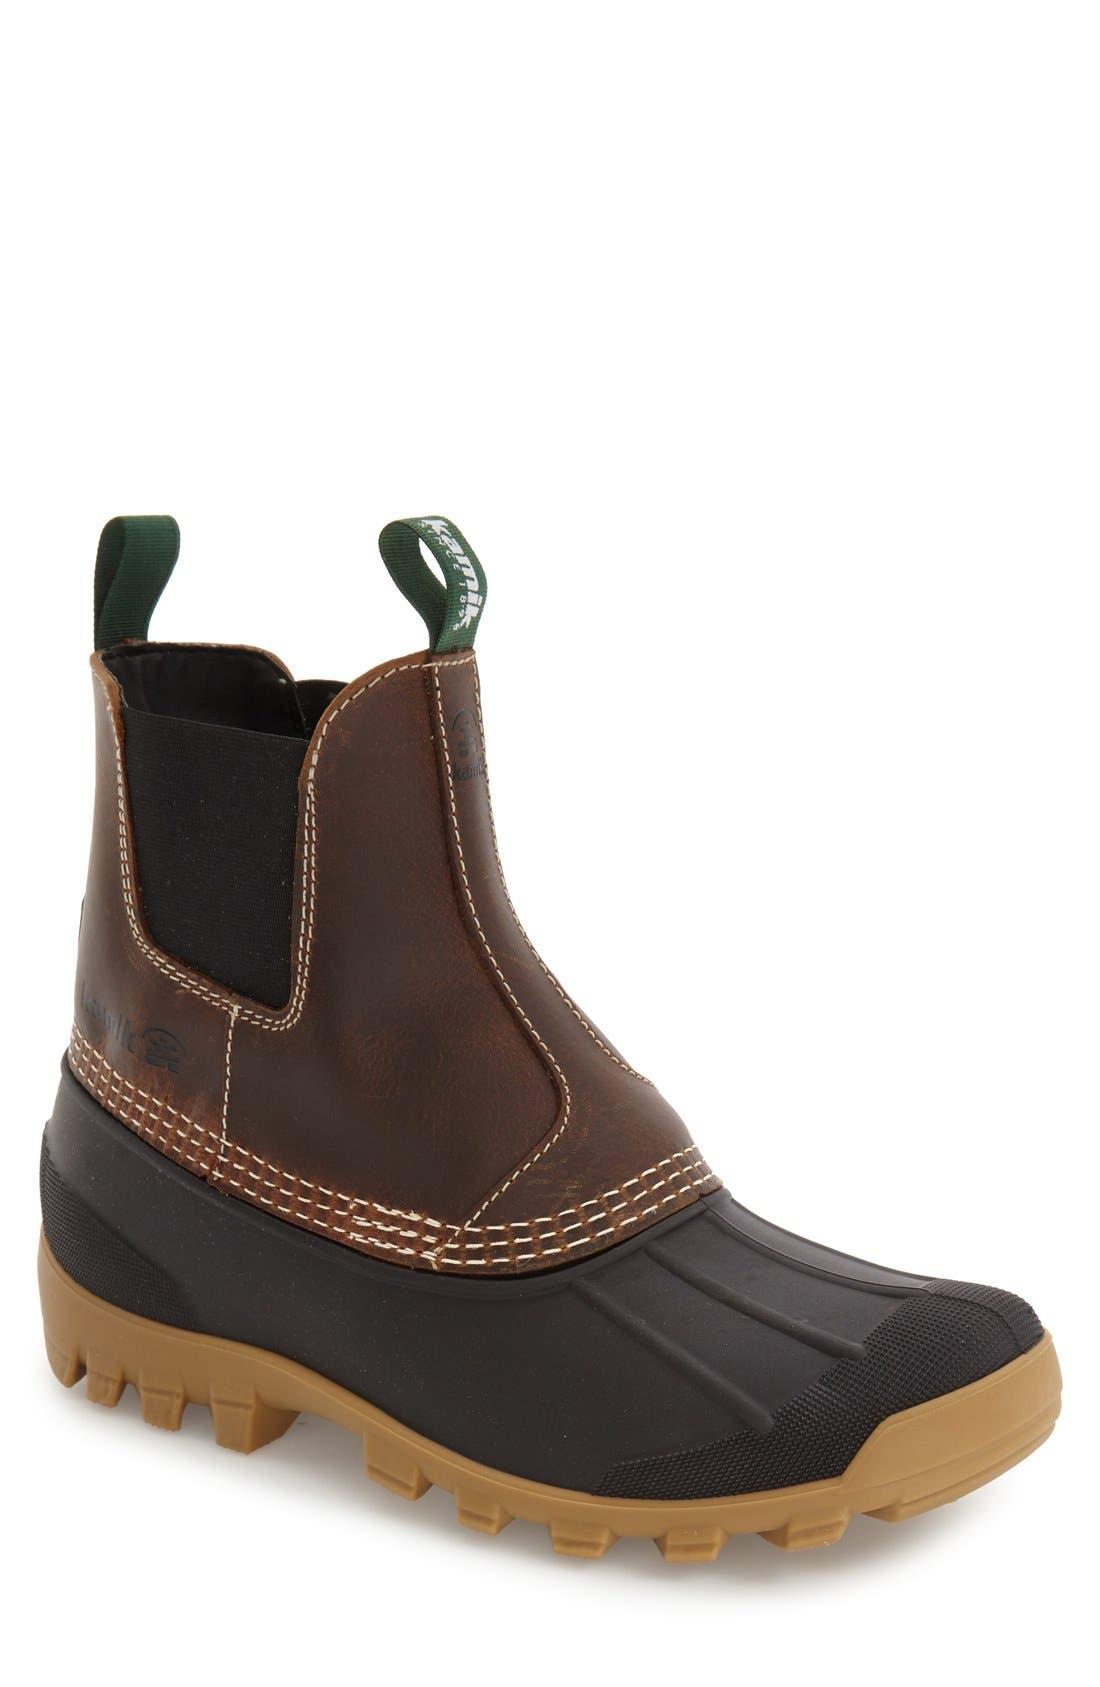 Yukon C Snow Boot,                         Main,                         color, Dark Brown Leather